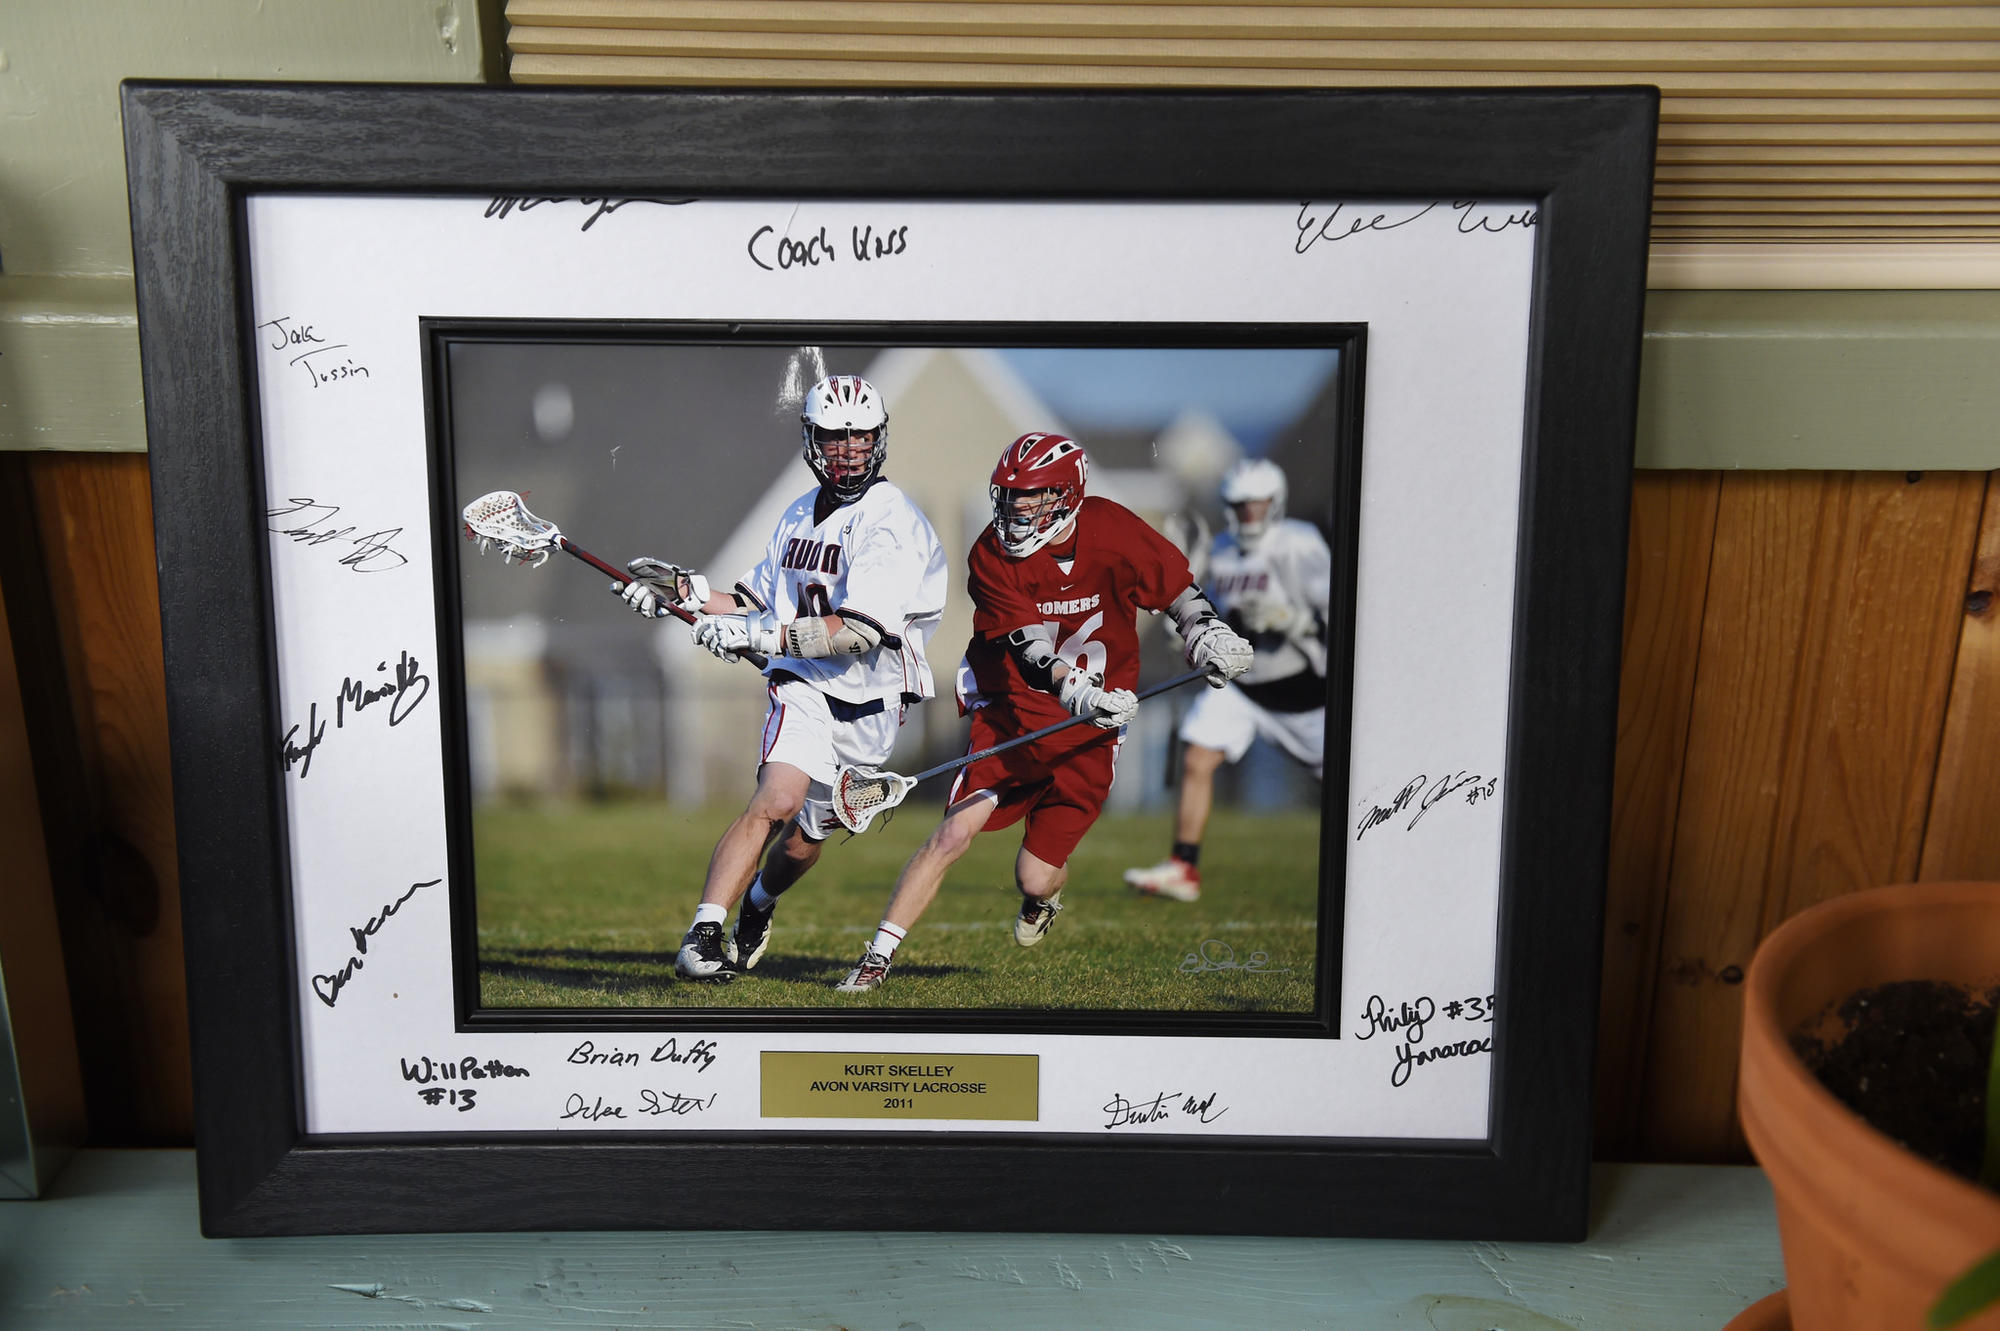 Memorial Lacrosse Game Saturday To Honor Life Of Avon Grad | Hartford Courant